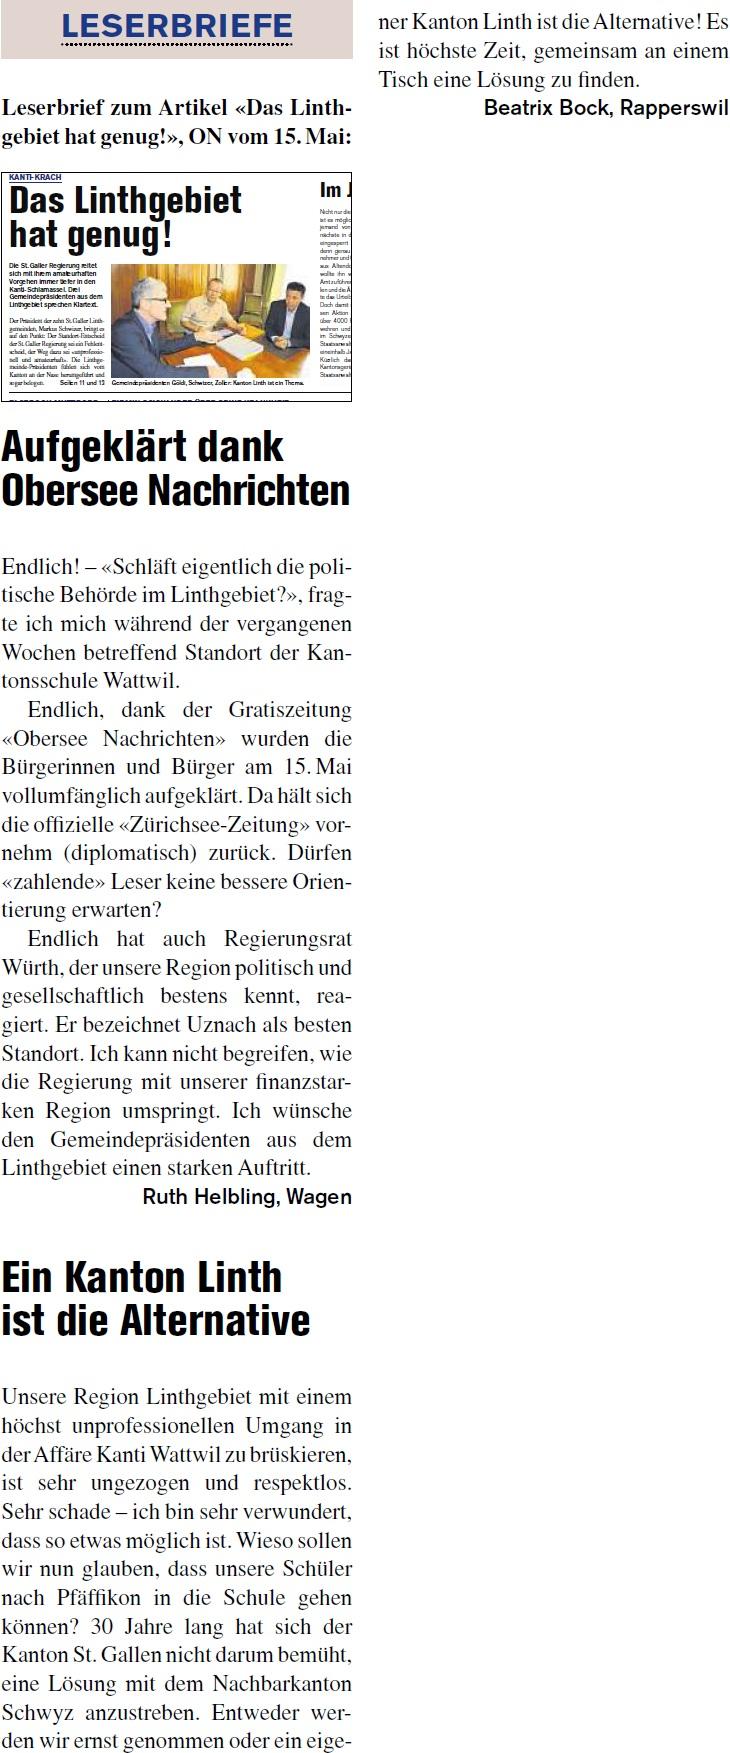 Das Linthgebiet hat genug! - Leserbriefe (Donnerstag, 22.05.2014)